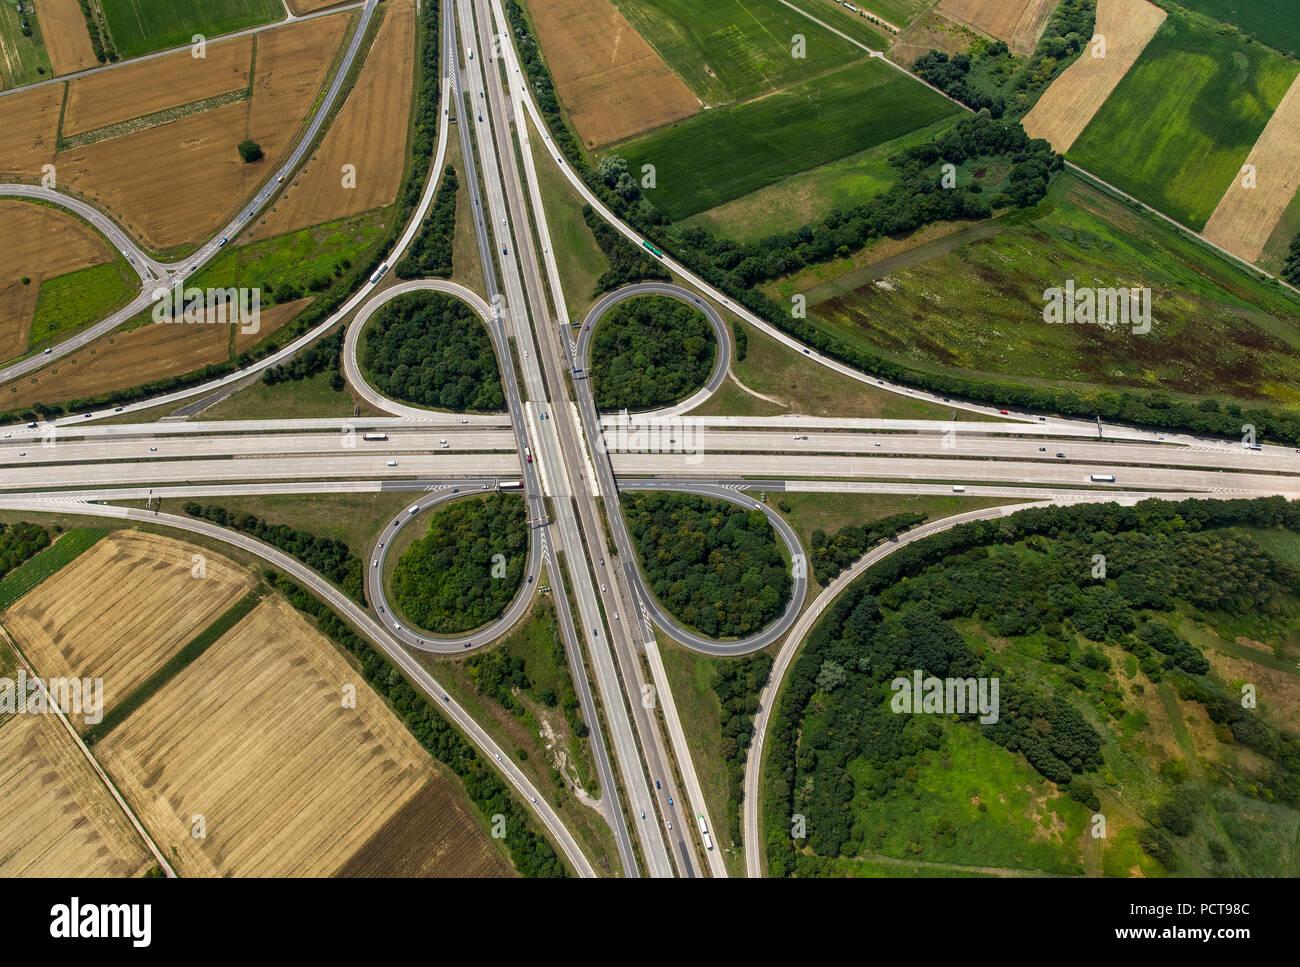 Autobahnkreuz Walldorf interchange, A5 and A6 Autobahnen (motorways), cloverleaf interchange, Walldorf, Baden-Wuerttemberg, Germany - Stock Image